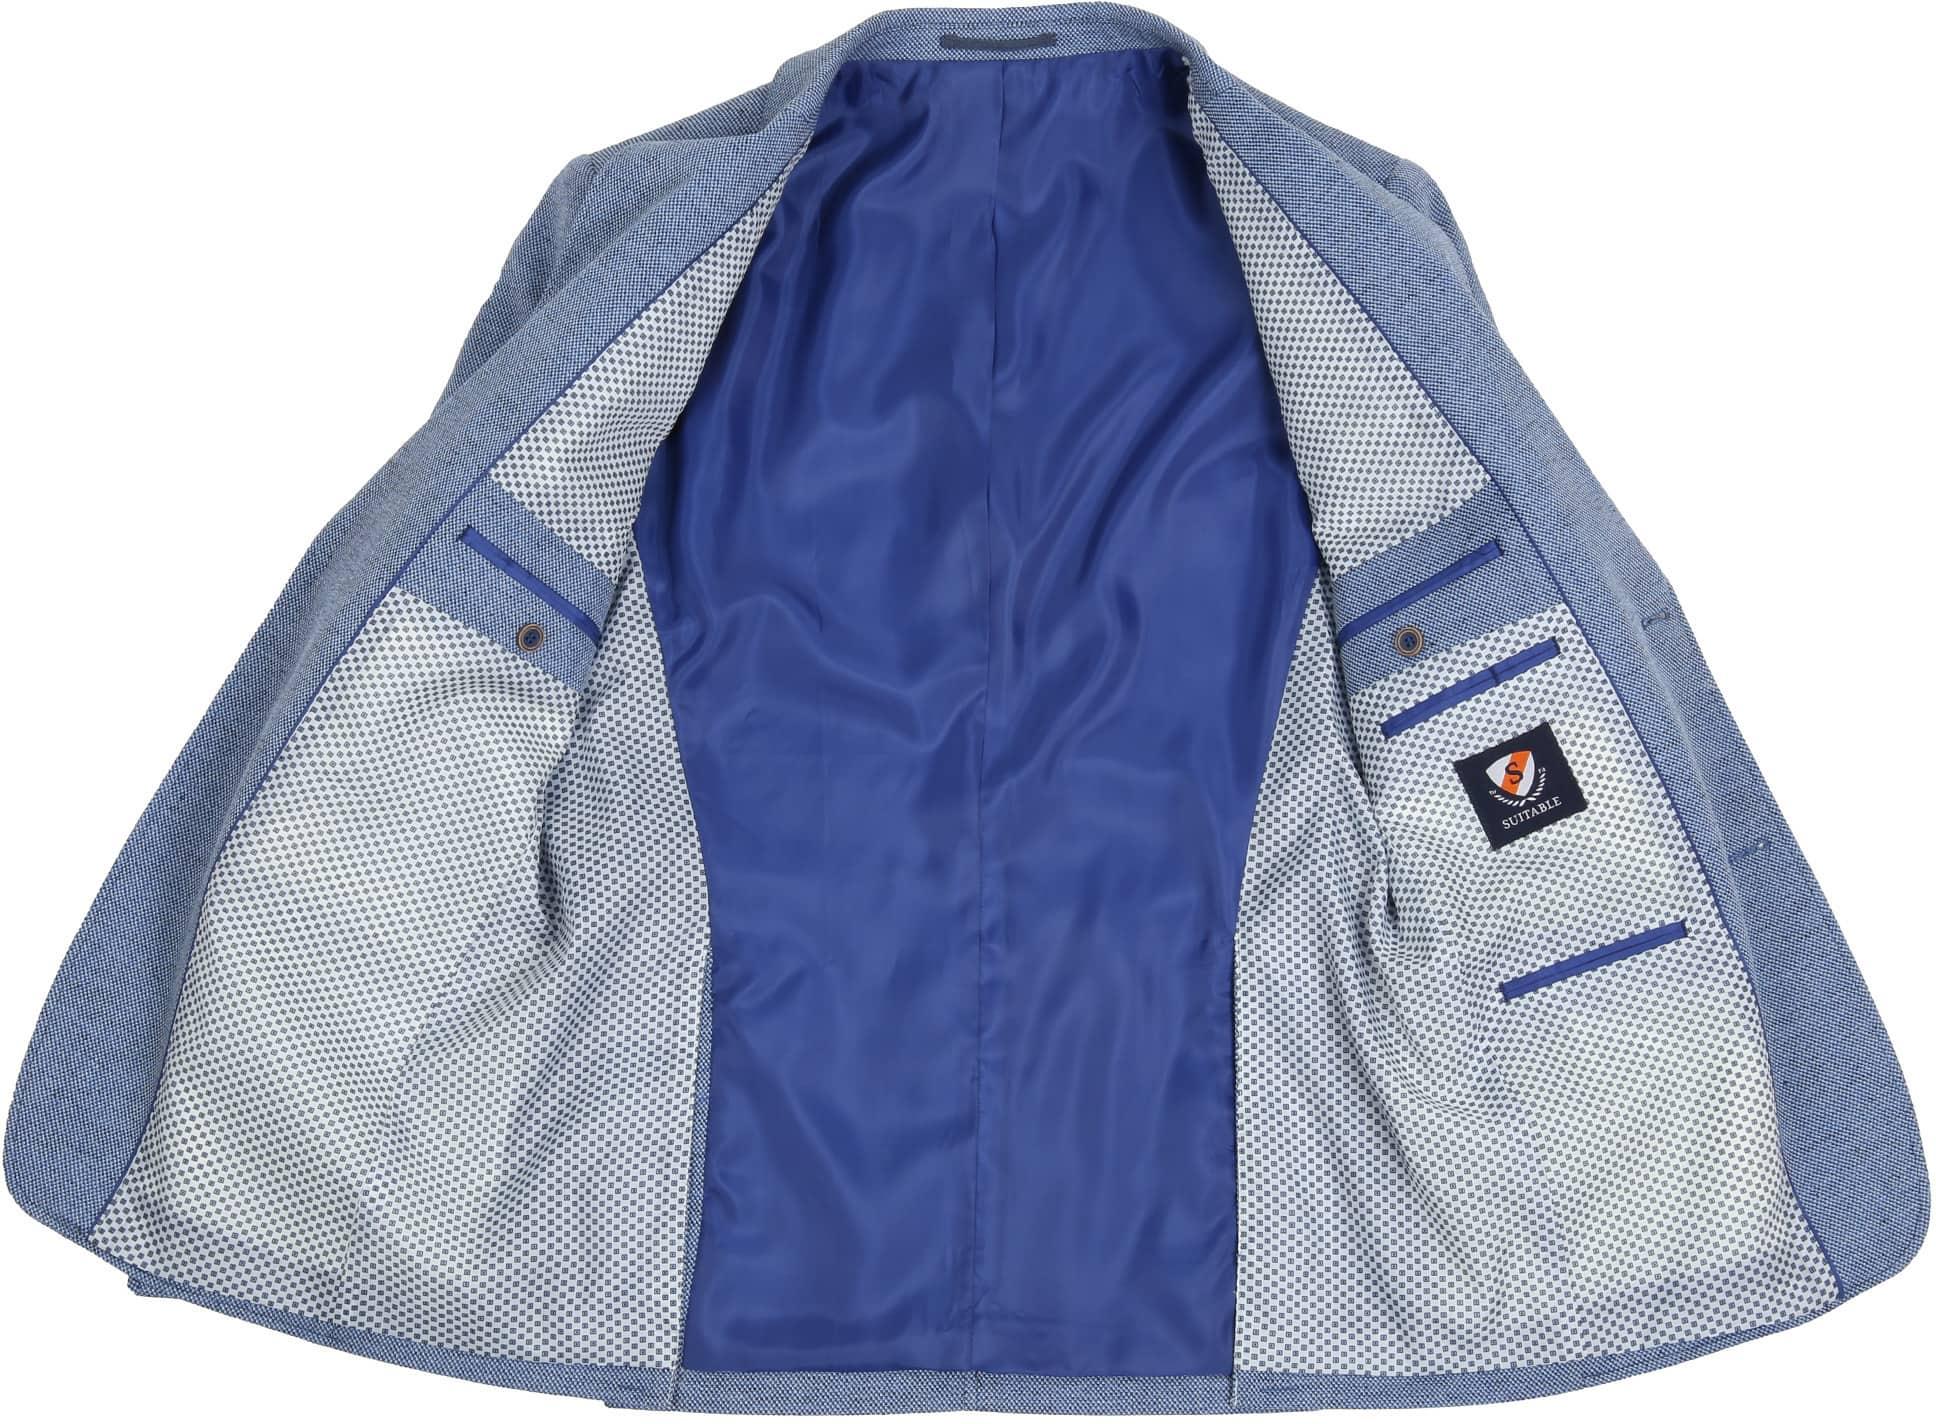 Suitable Blazer LeLuc Blau foto 2